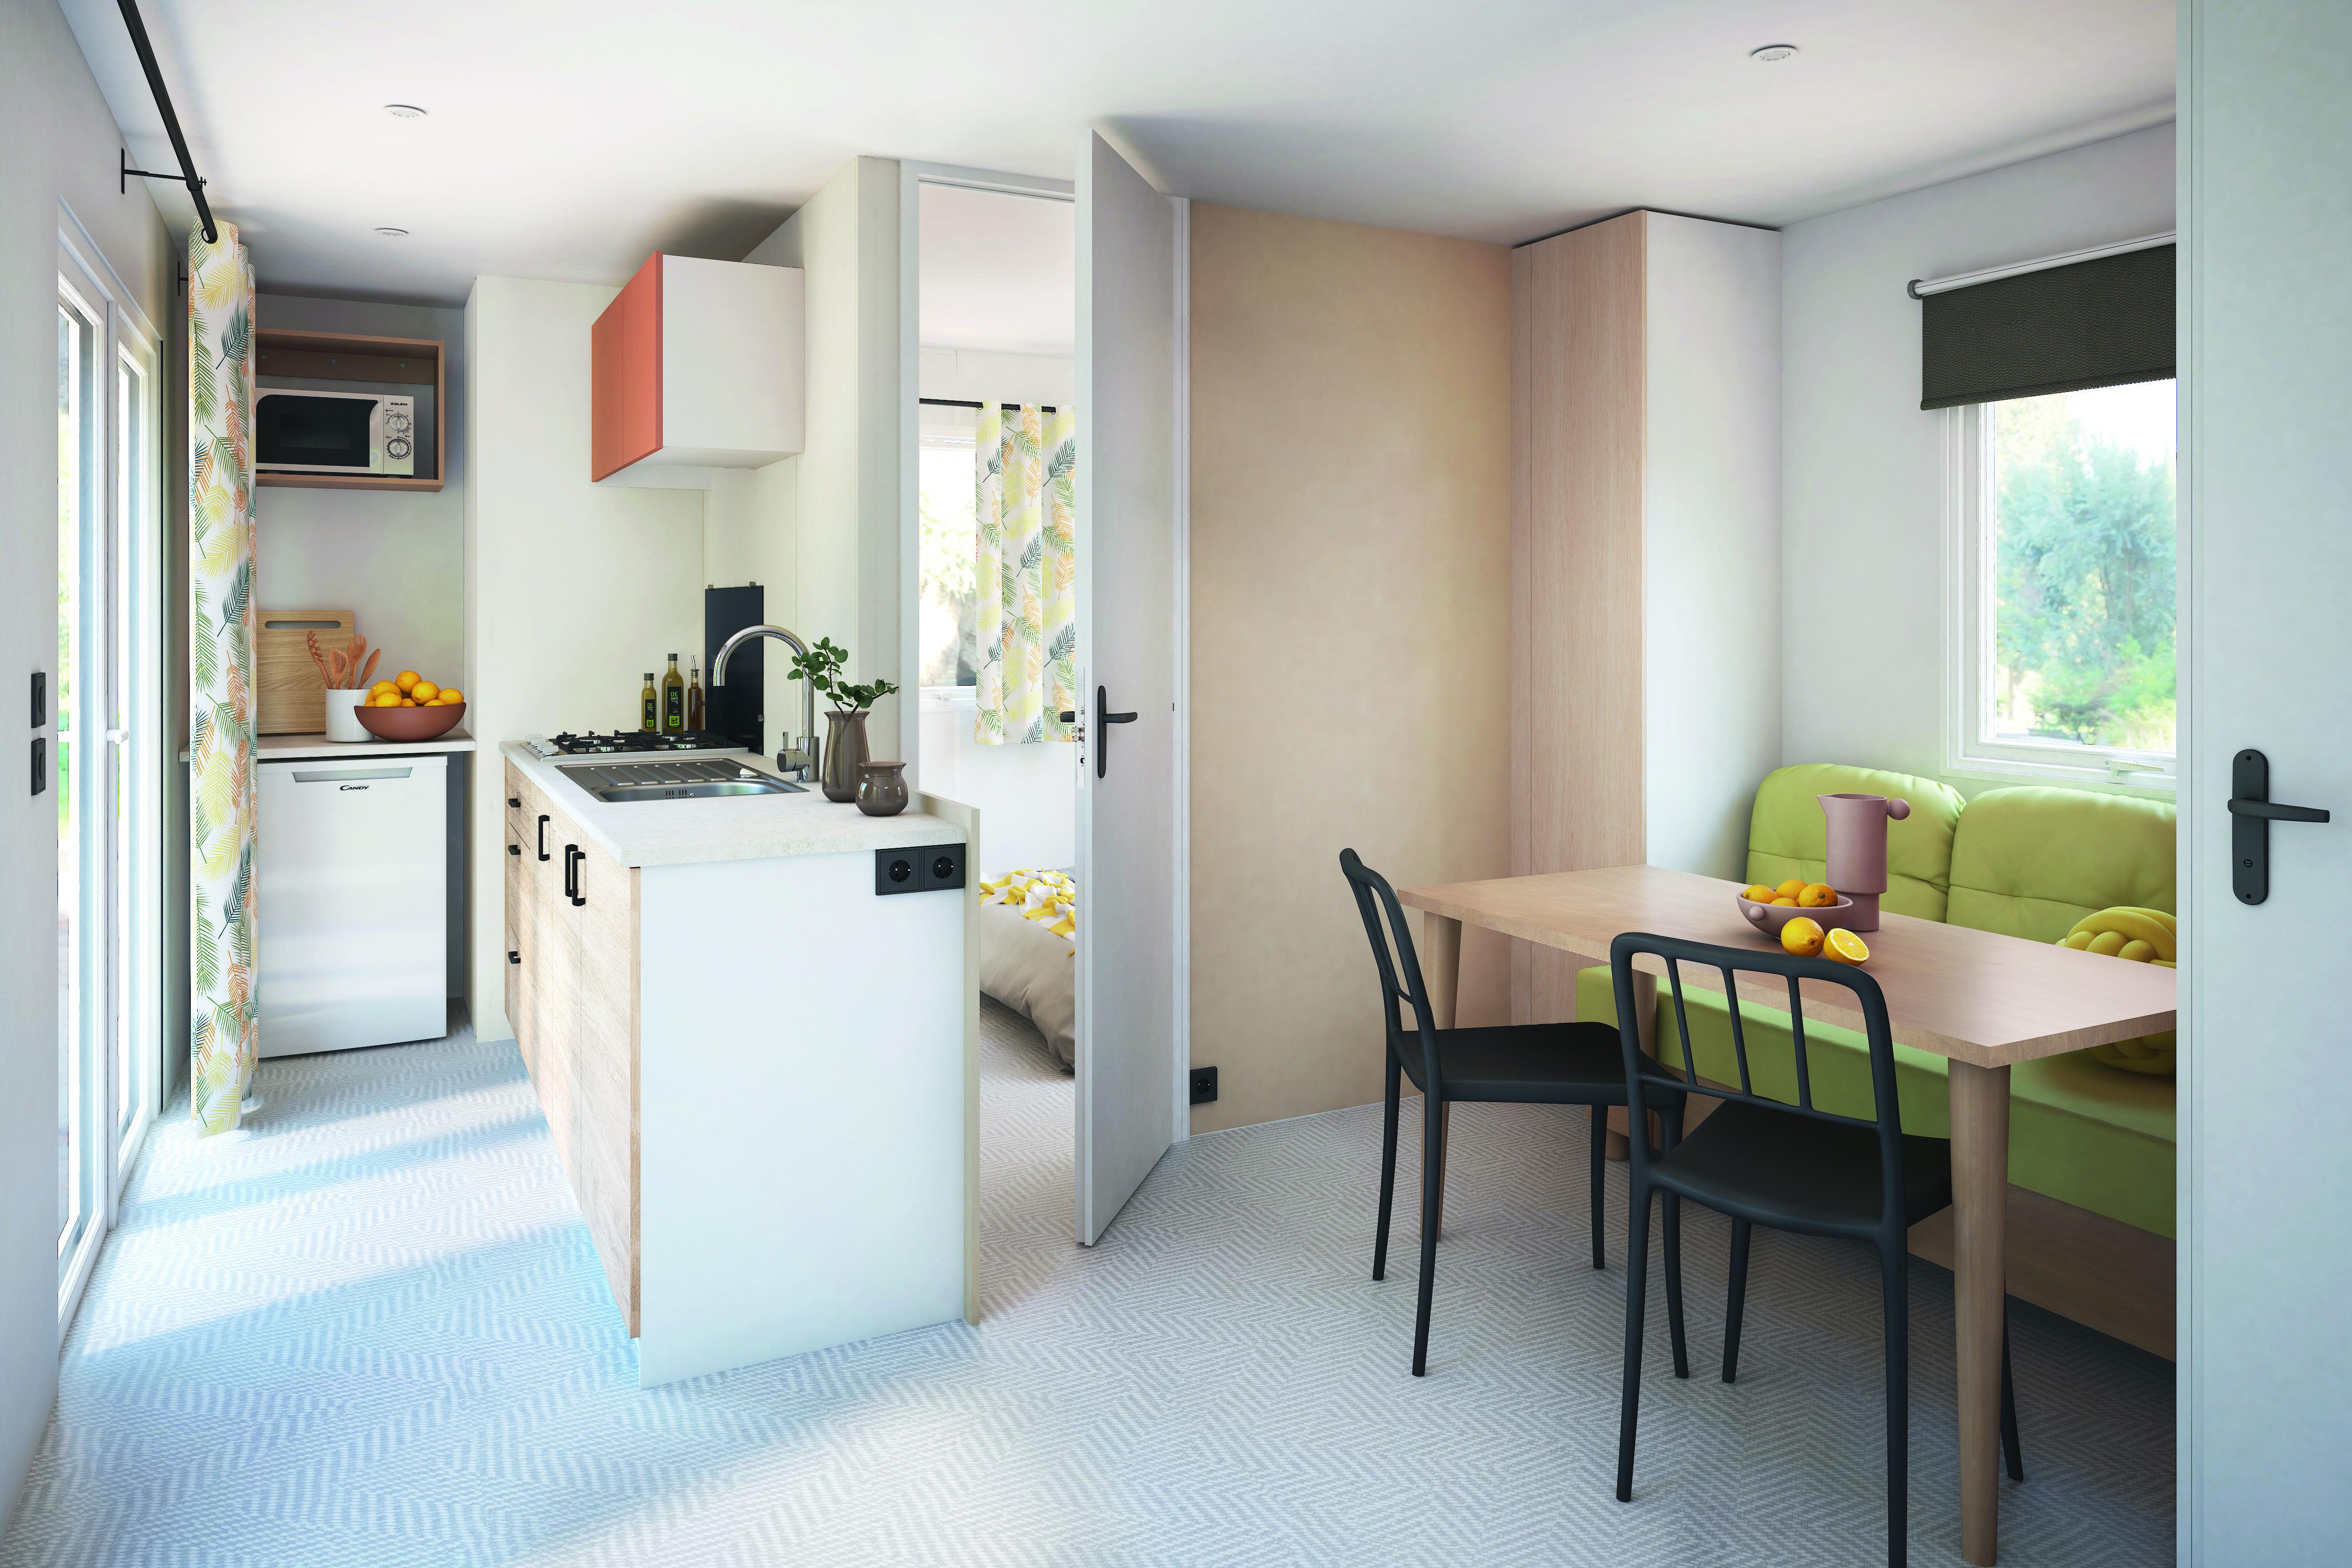 Mobil-home 4 Confort Plus - 25m² - 2 chambres + terrasse couverte